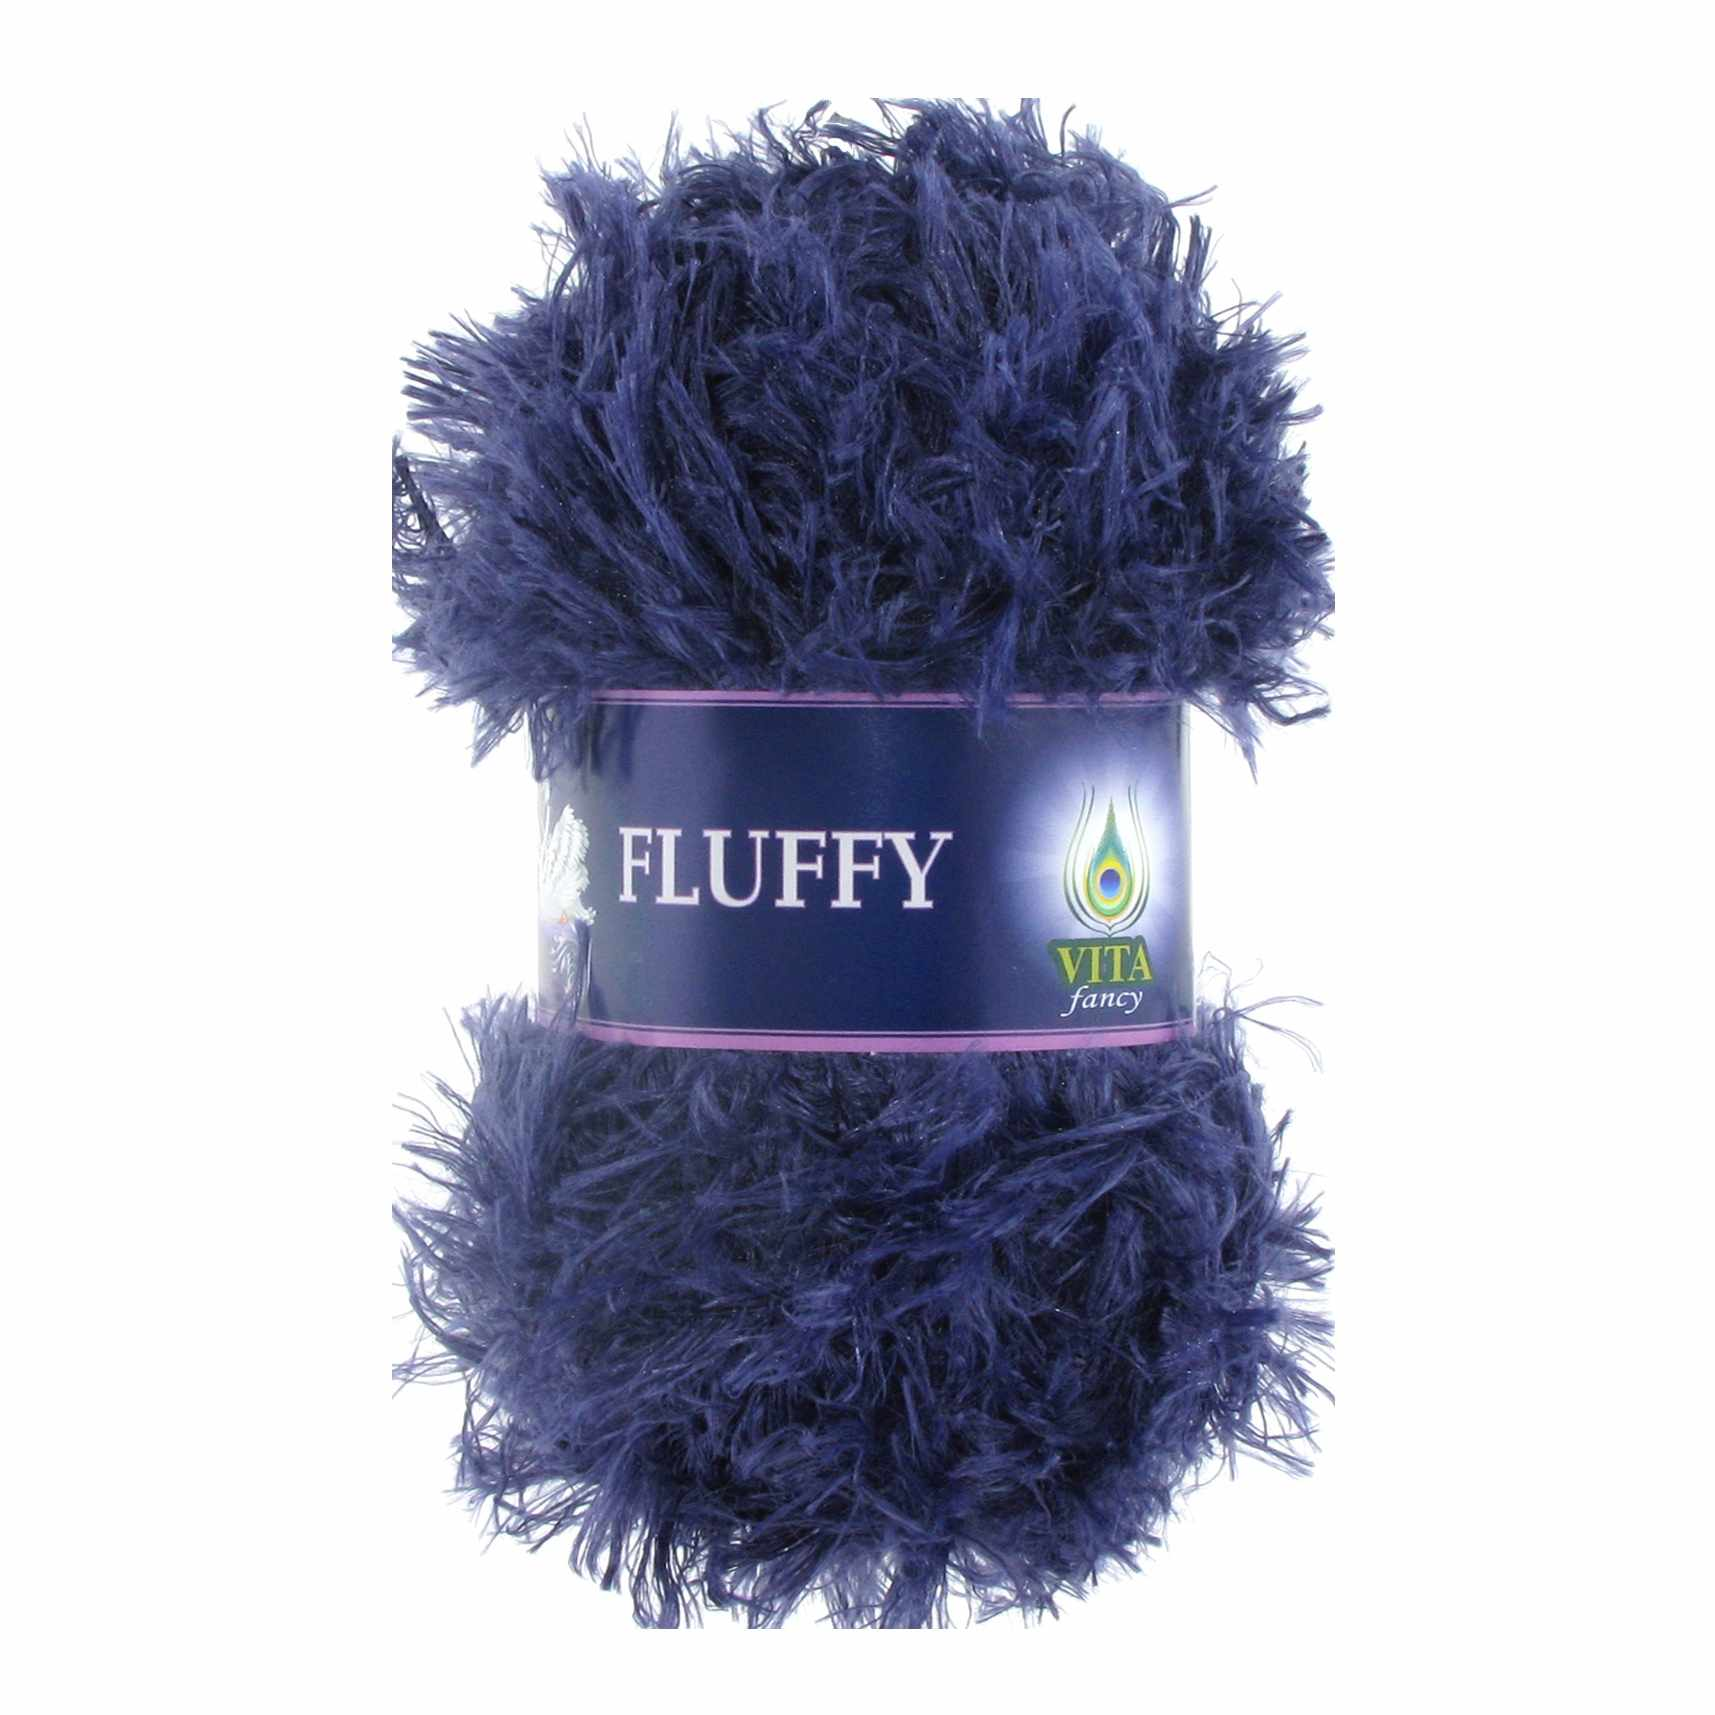 Пряжа VITA Fluffy Цвет.5457 Синий